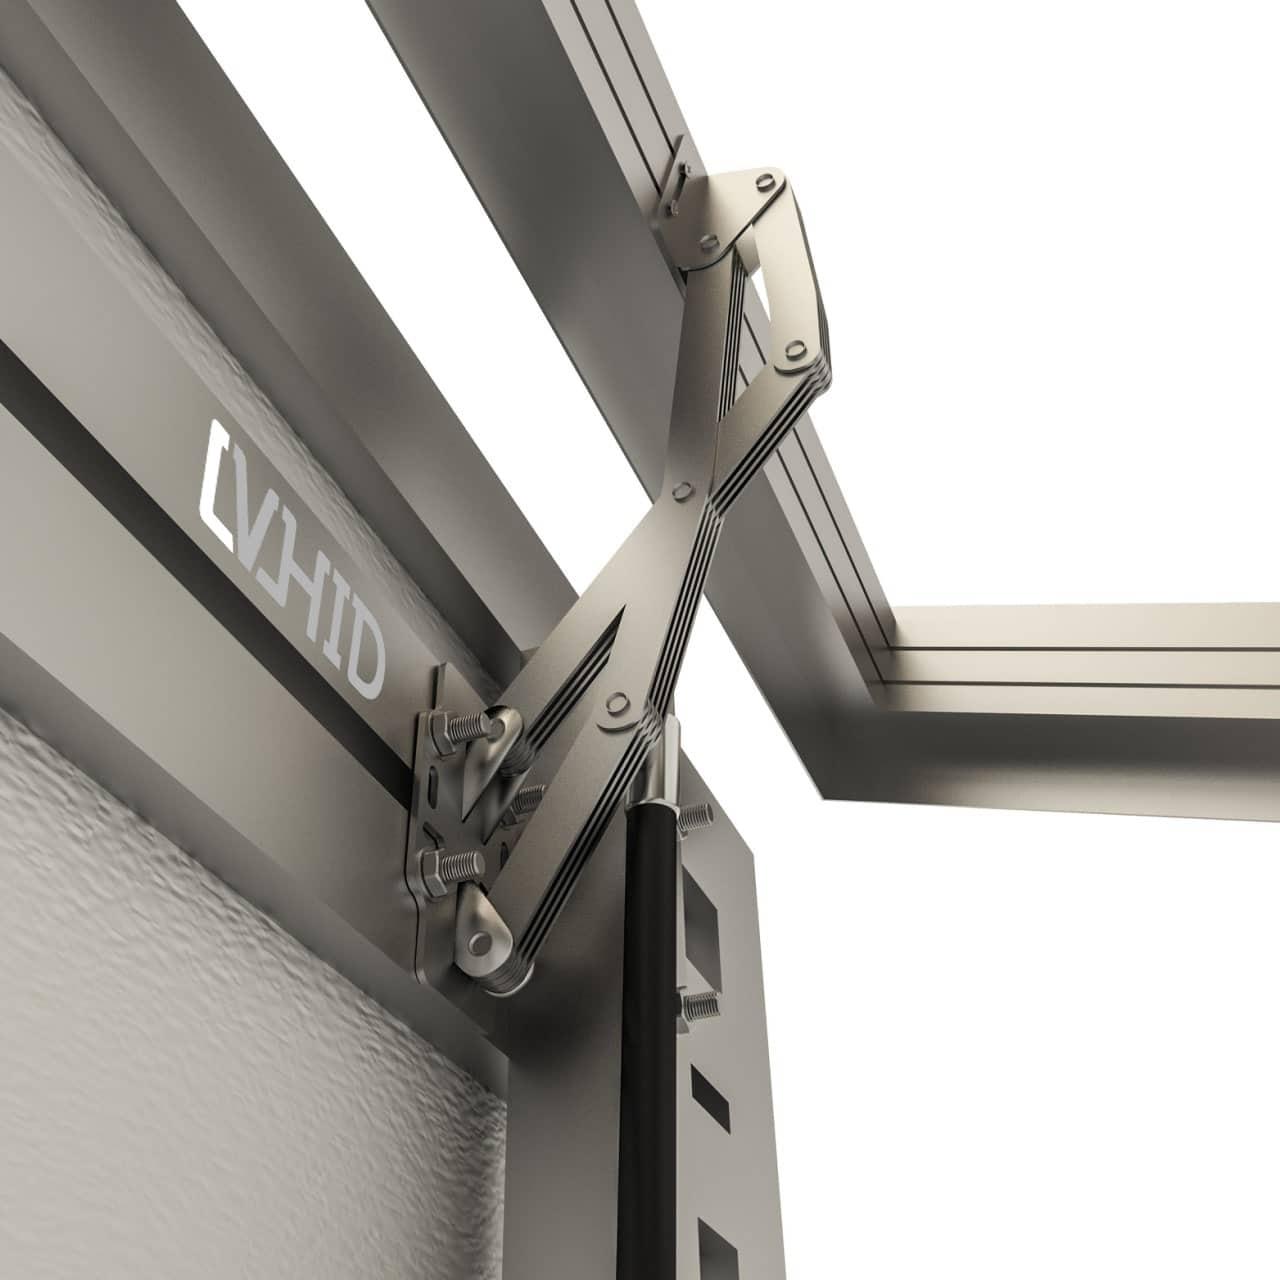 vhid-scissors-ceiling